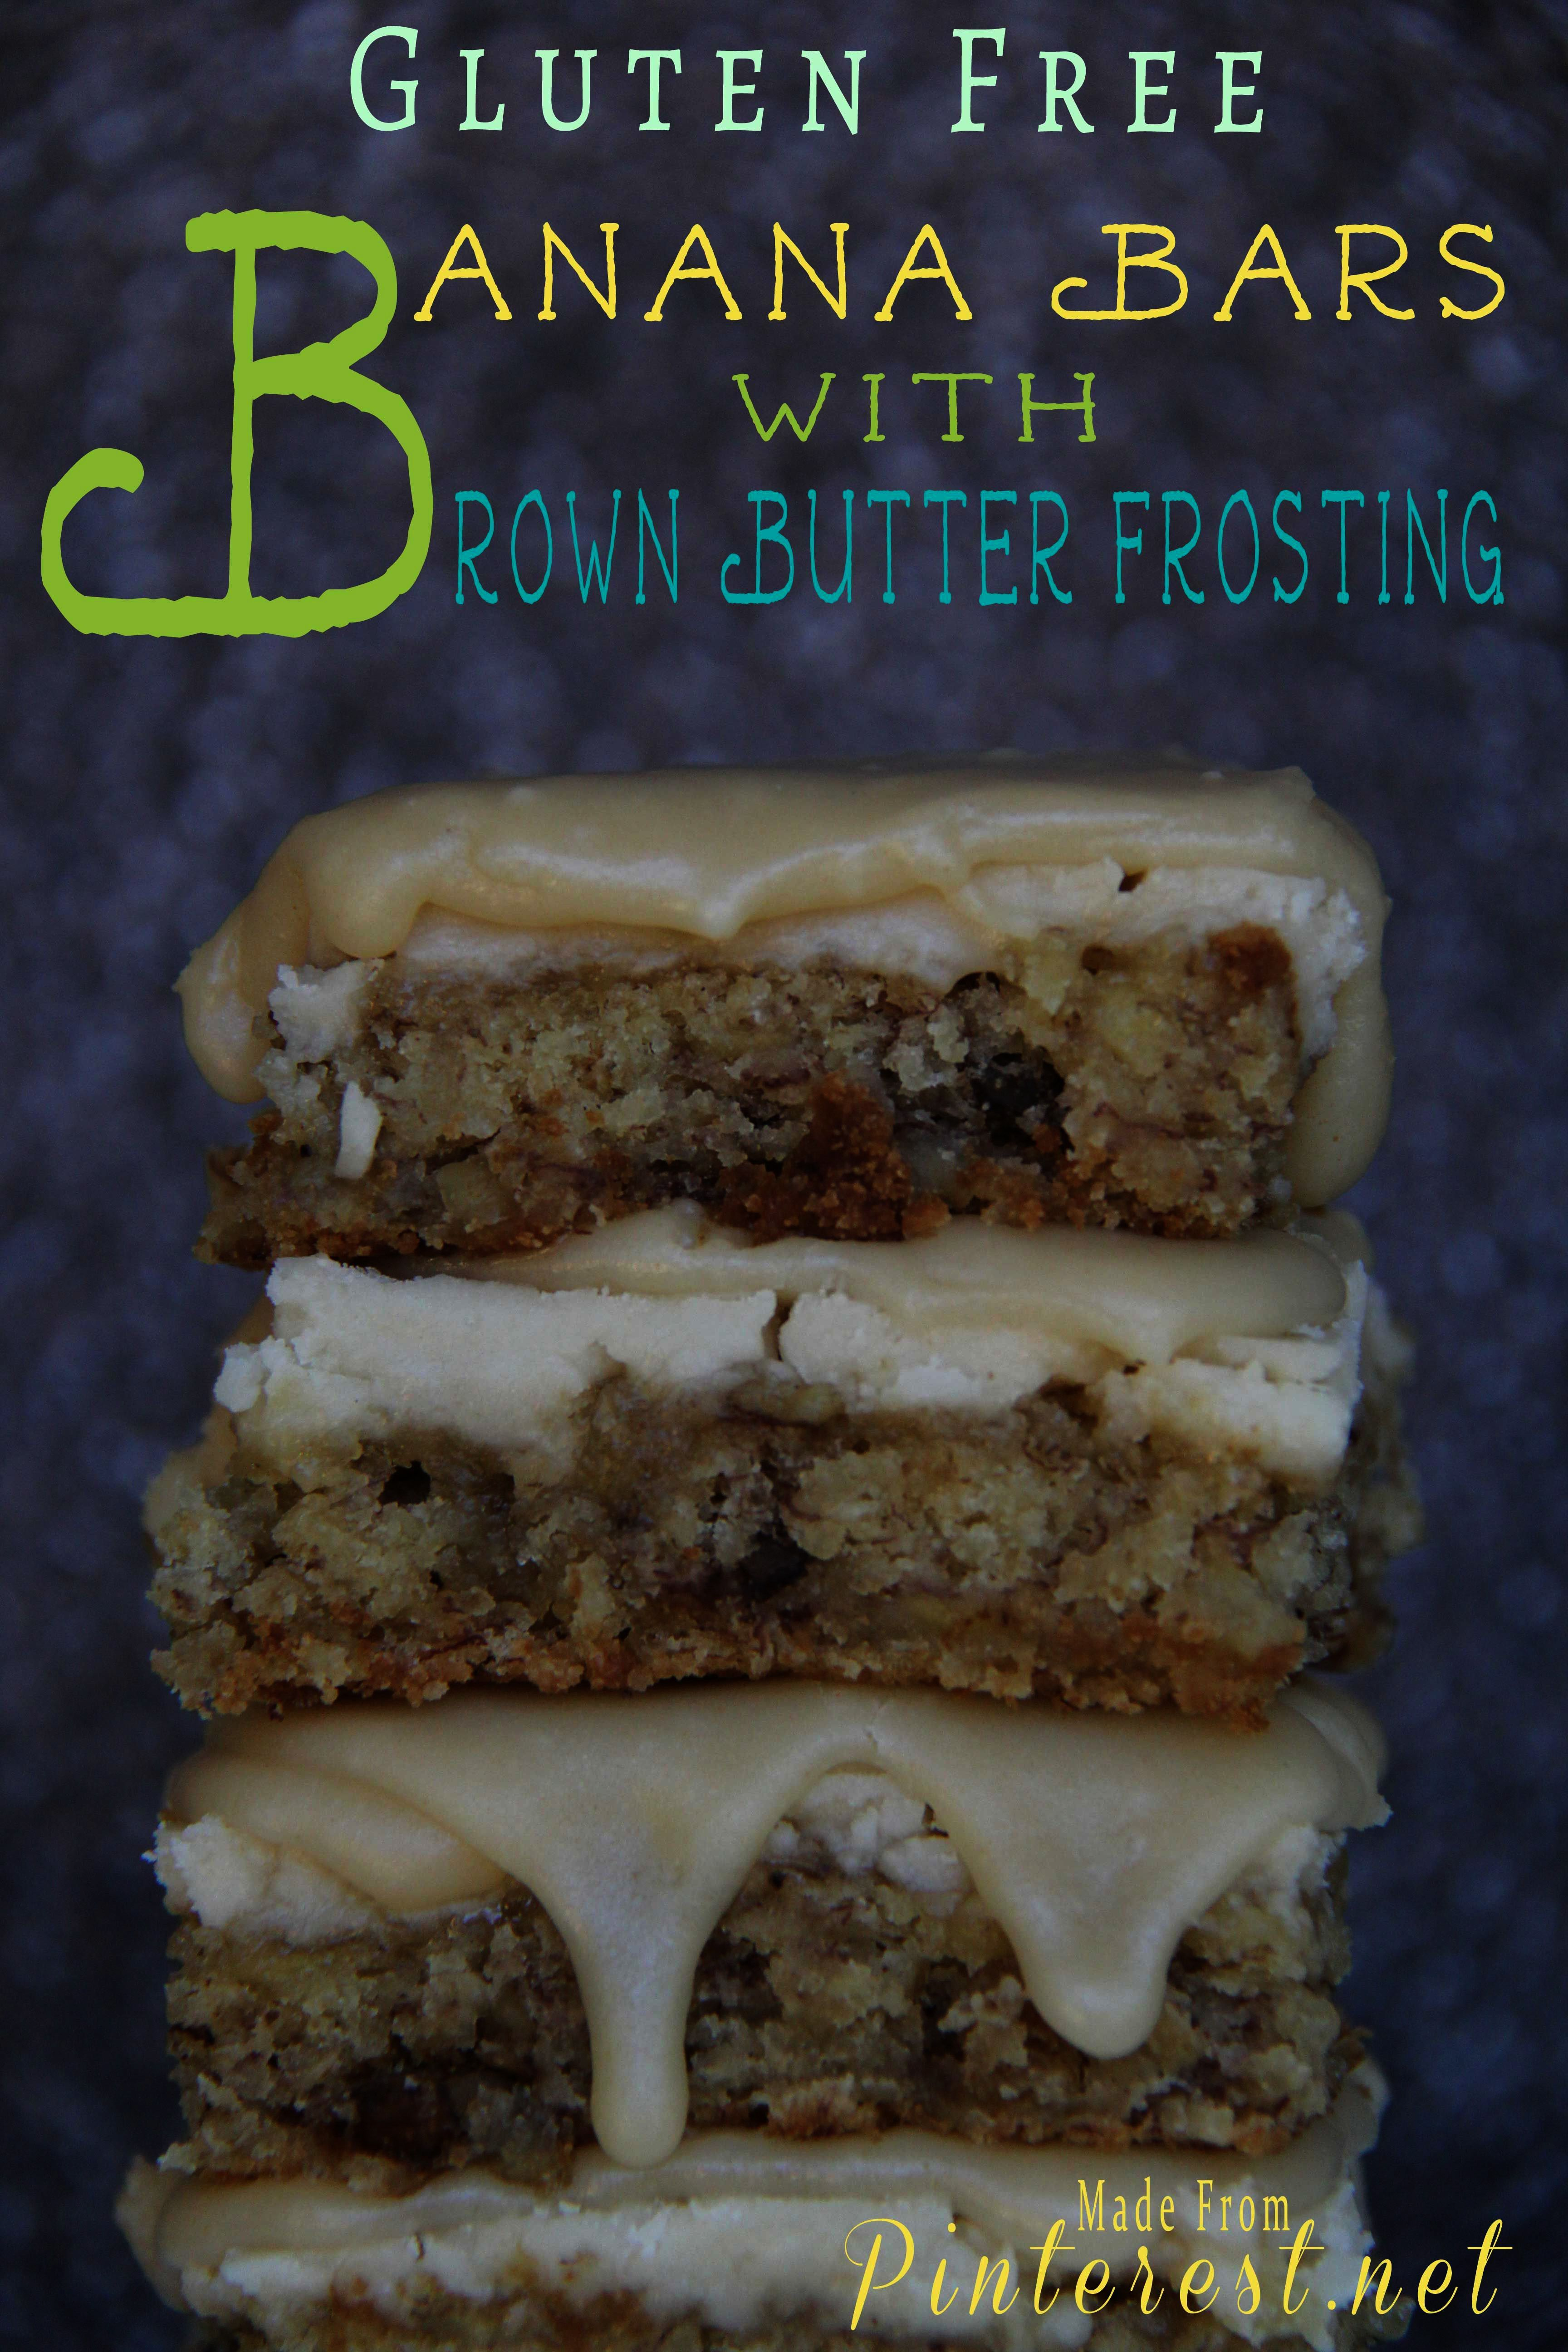 Dessert Recipes Key Lime Pie over Gluten Free Bakery Near